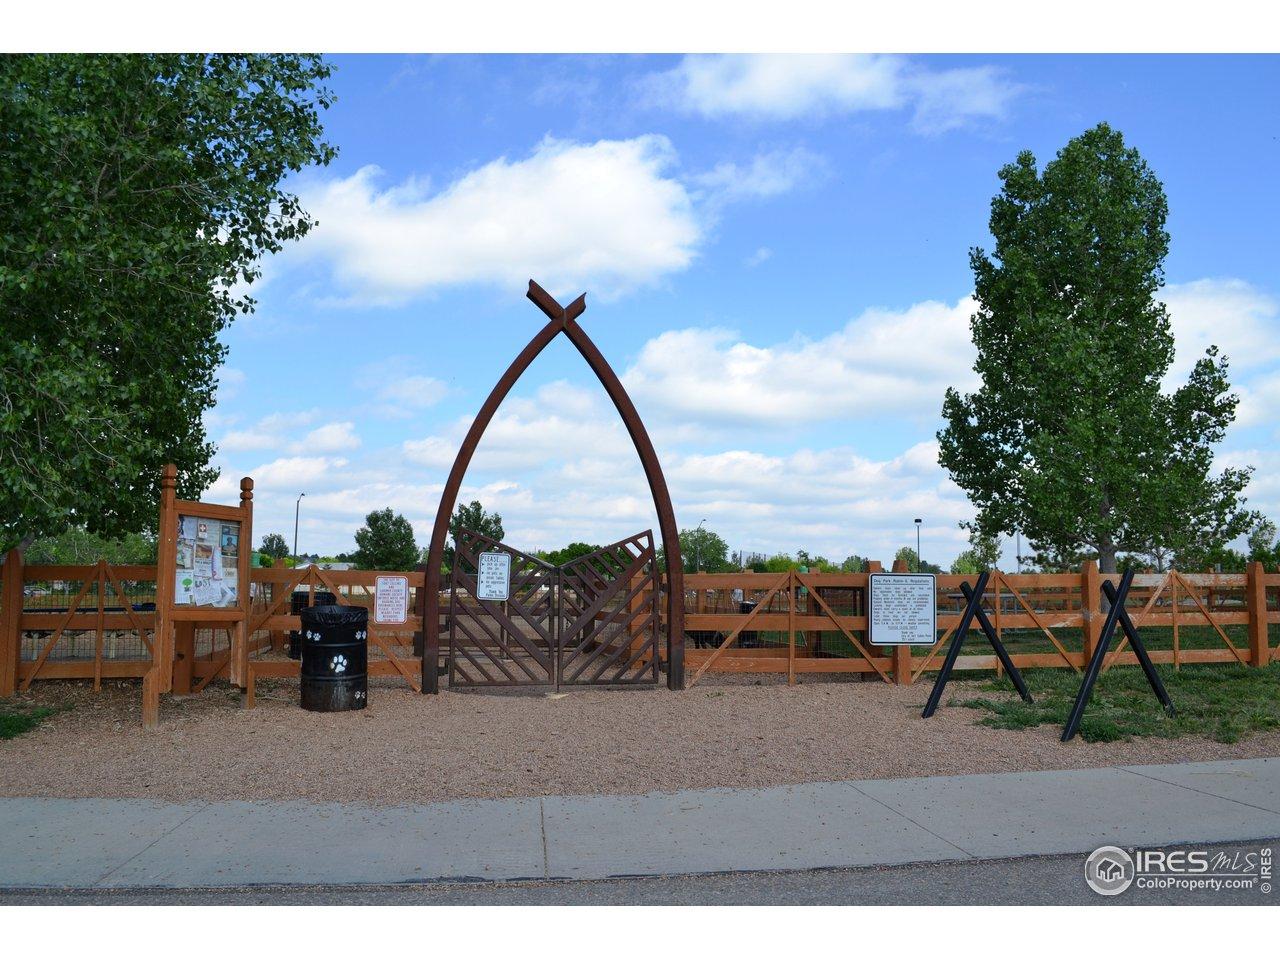 Fossil Creek Park dog park